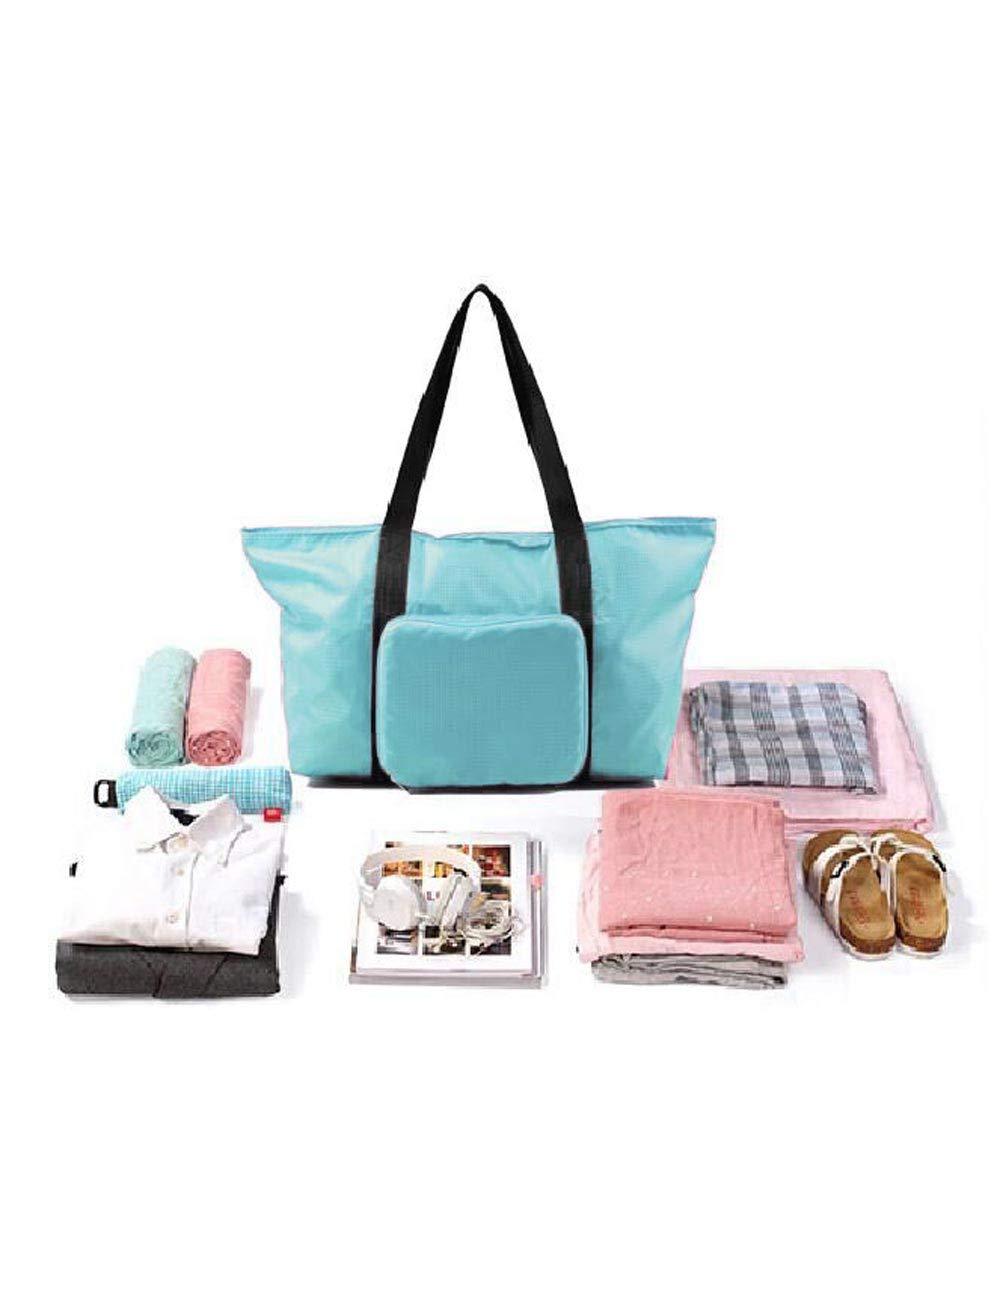 KARLA HANSON Pack n Fold Foldable Travel Tote Bag /… Black